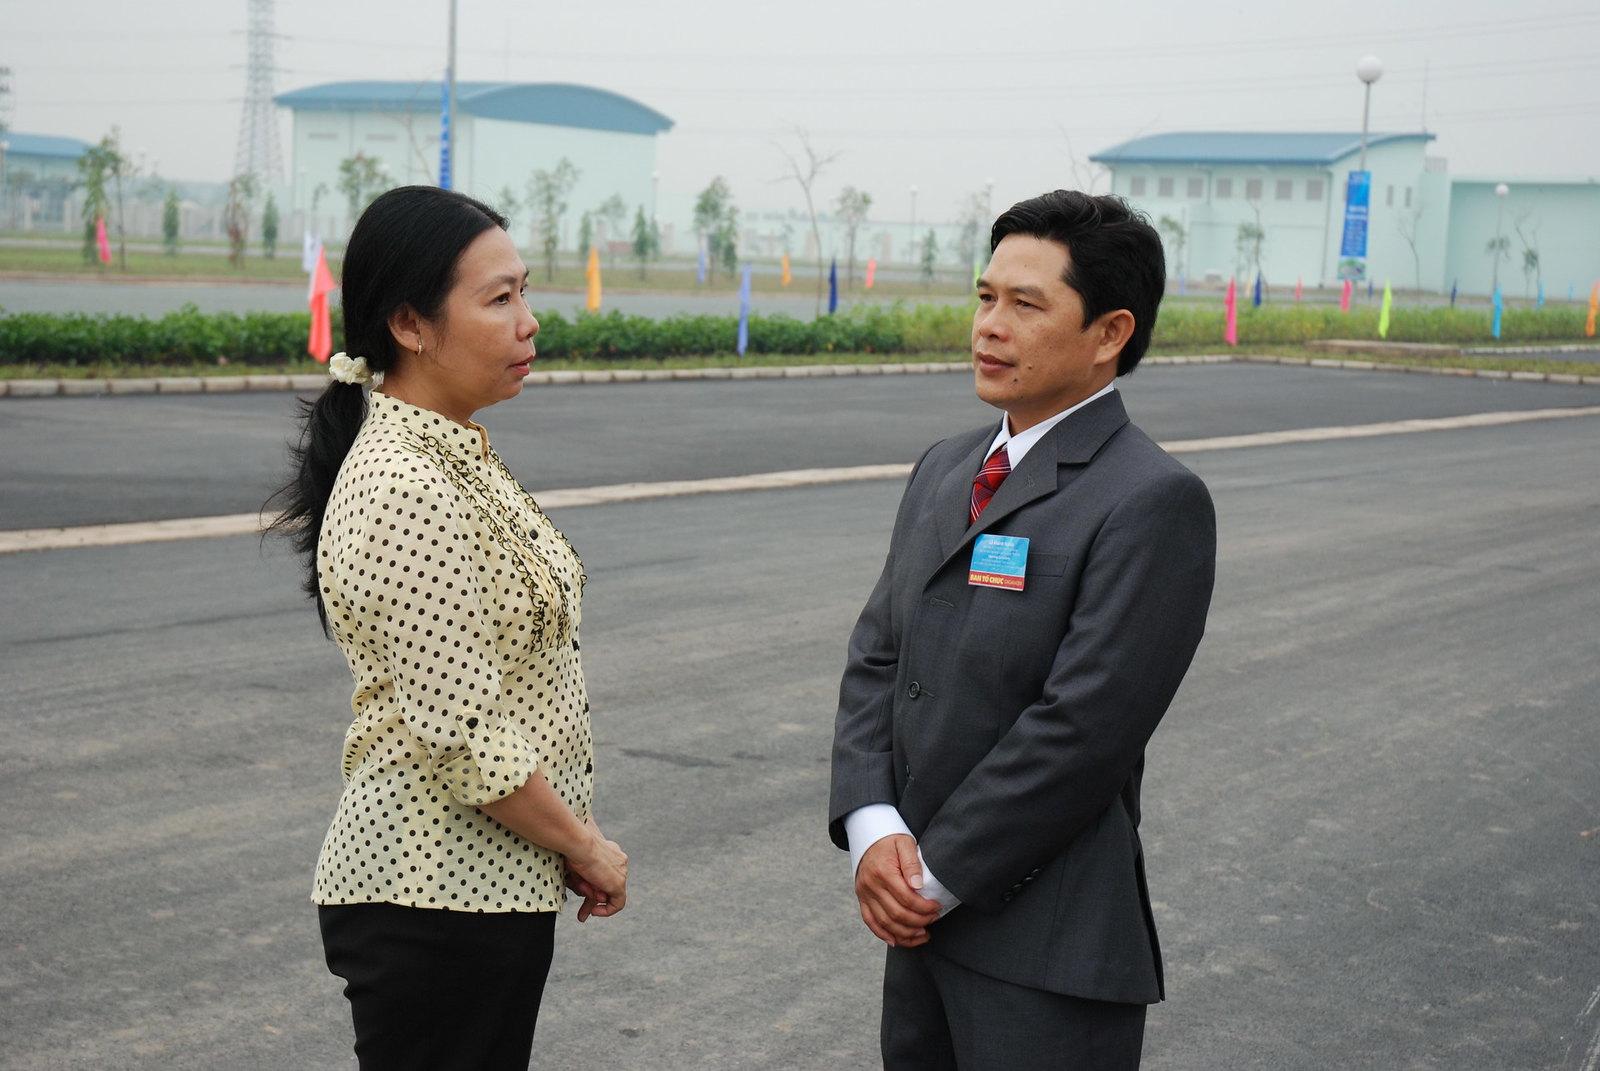 Du an Moi truong nuoc-GD1-Khanh thanh nha may-02